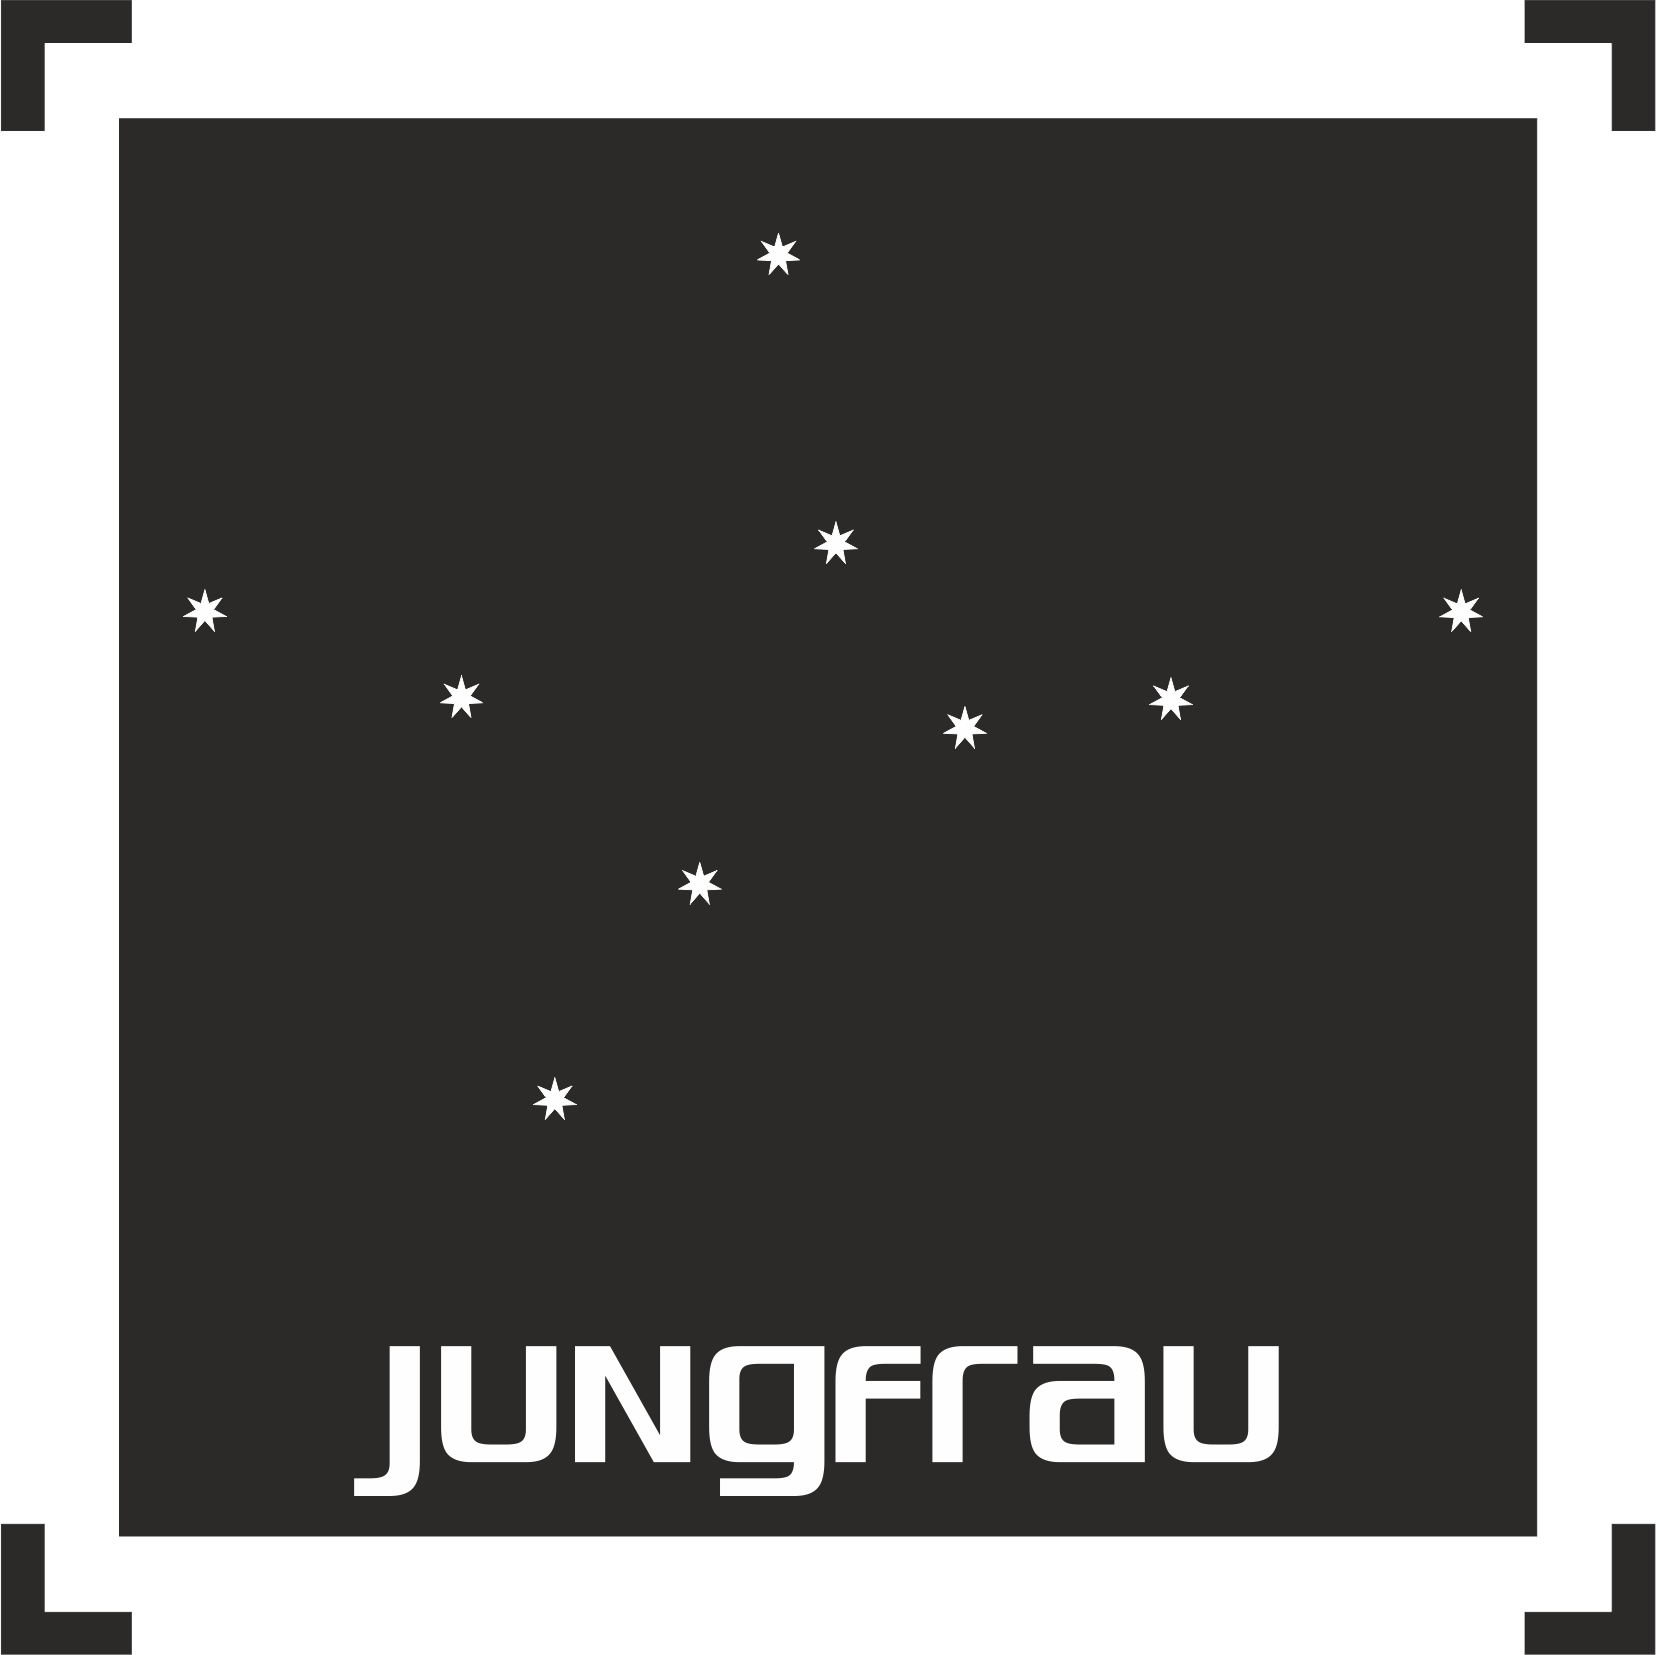 Jungfrau -003